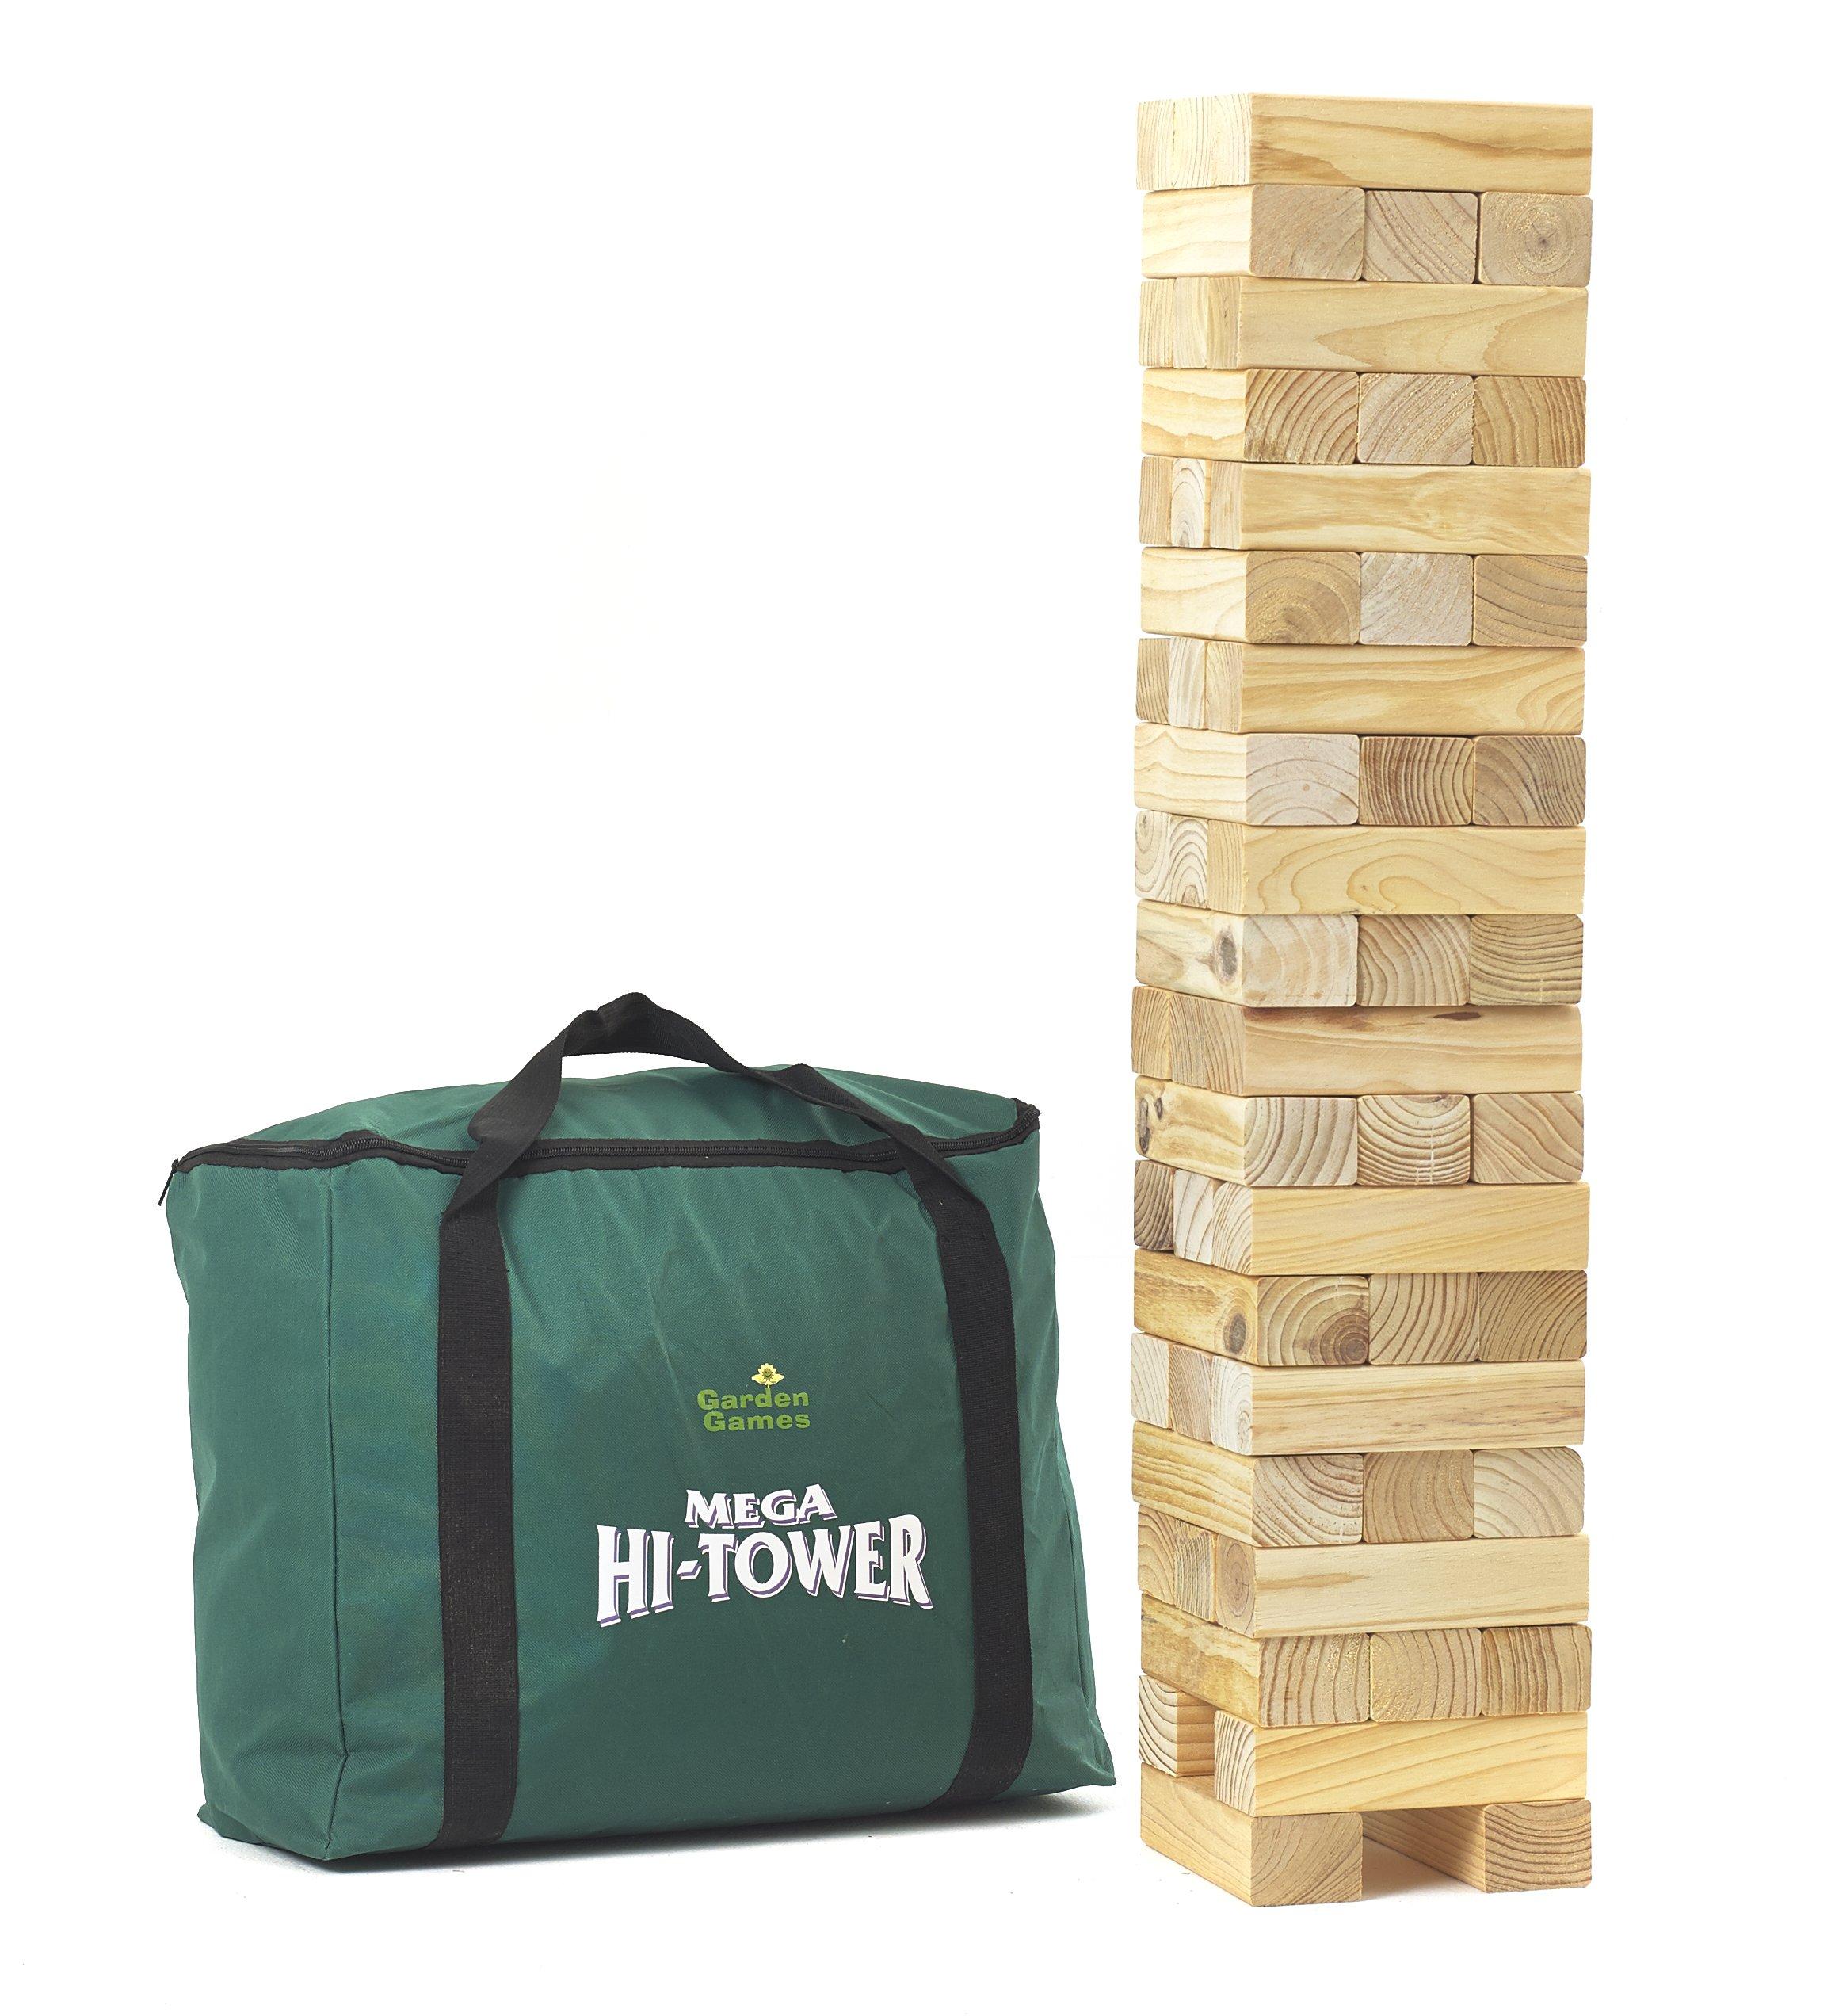 Garden Games Mega Hi-Tower in A Bag - Giant 0.9m - 1.5. Wooden Tower Block Game